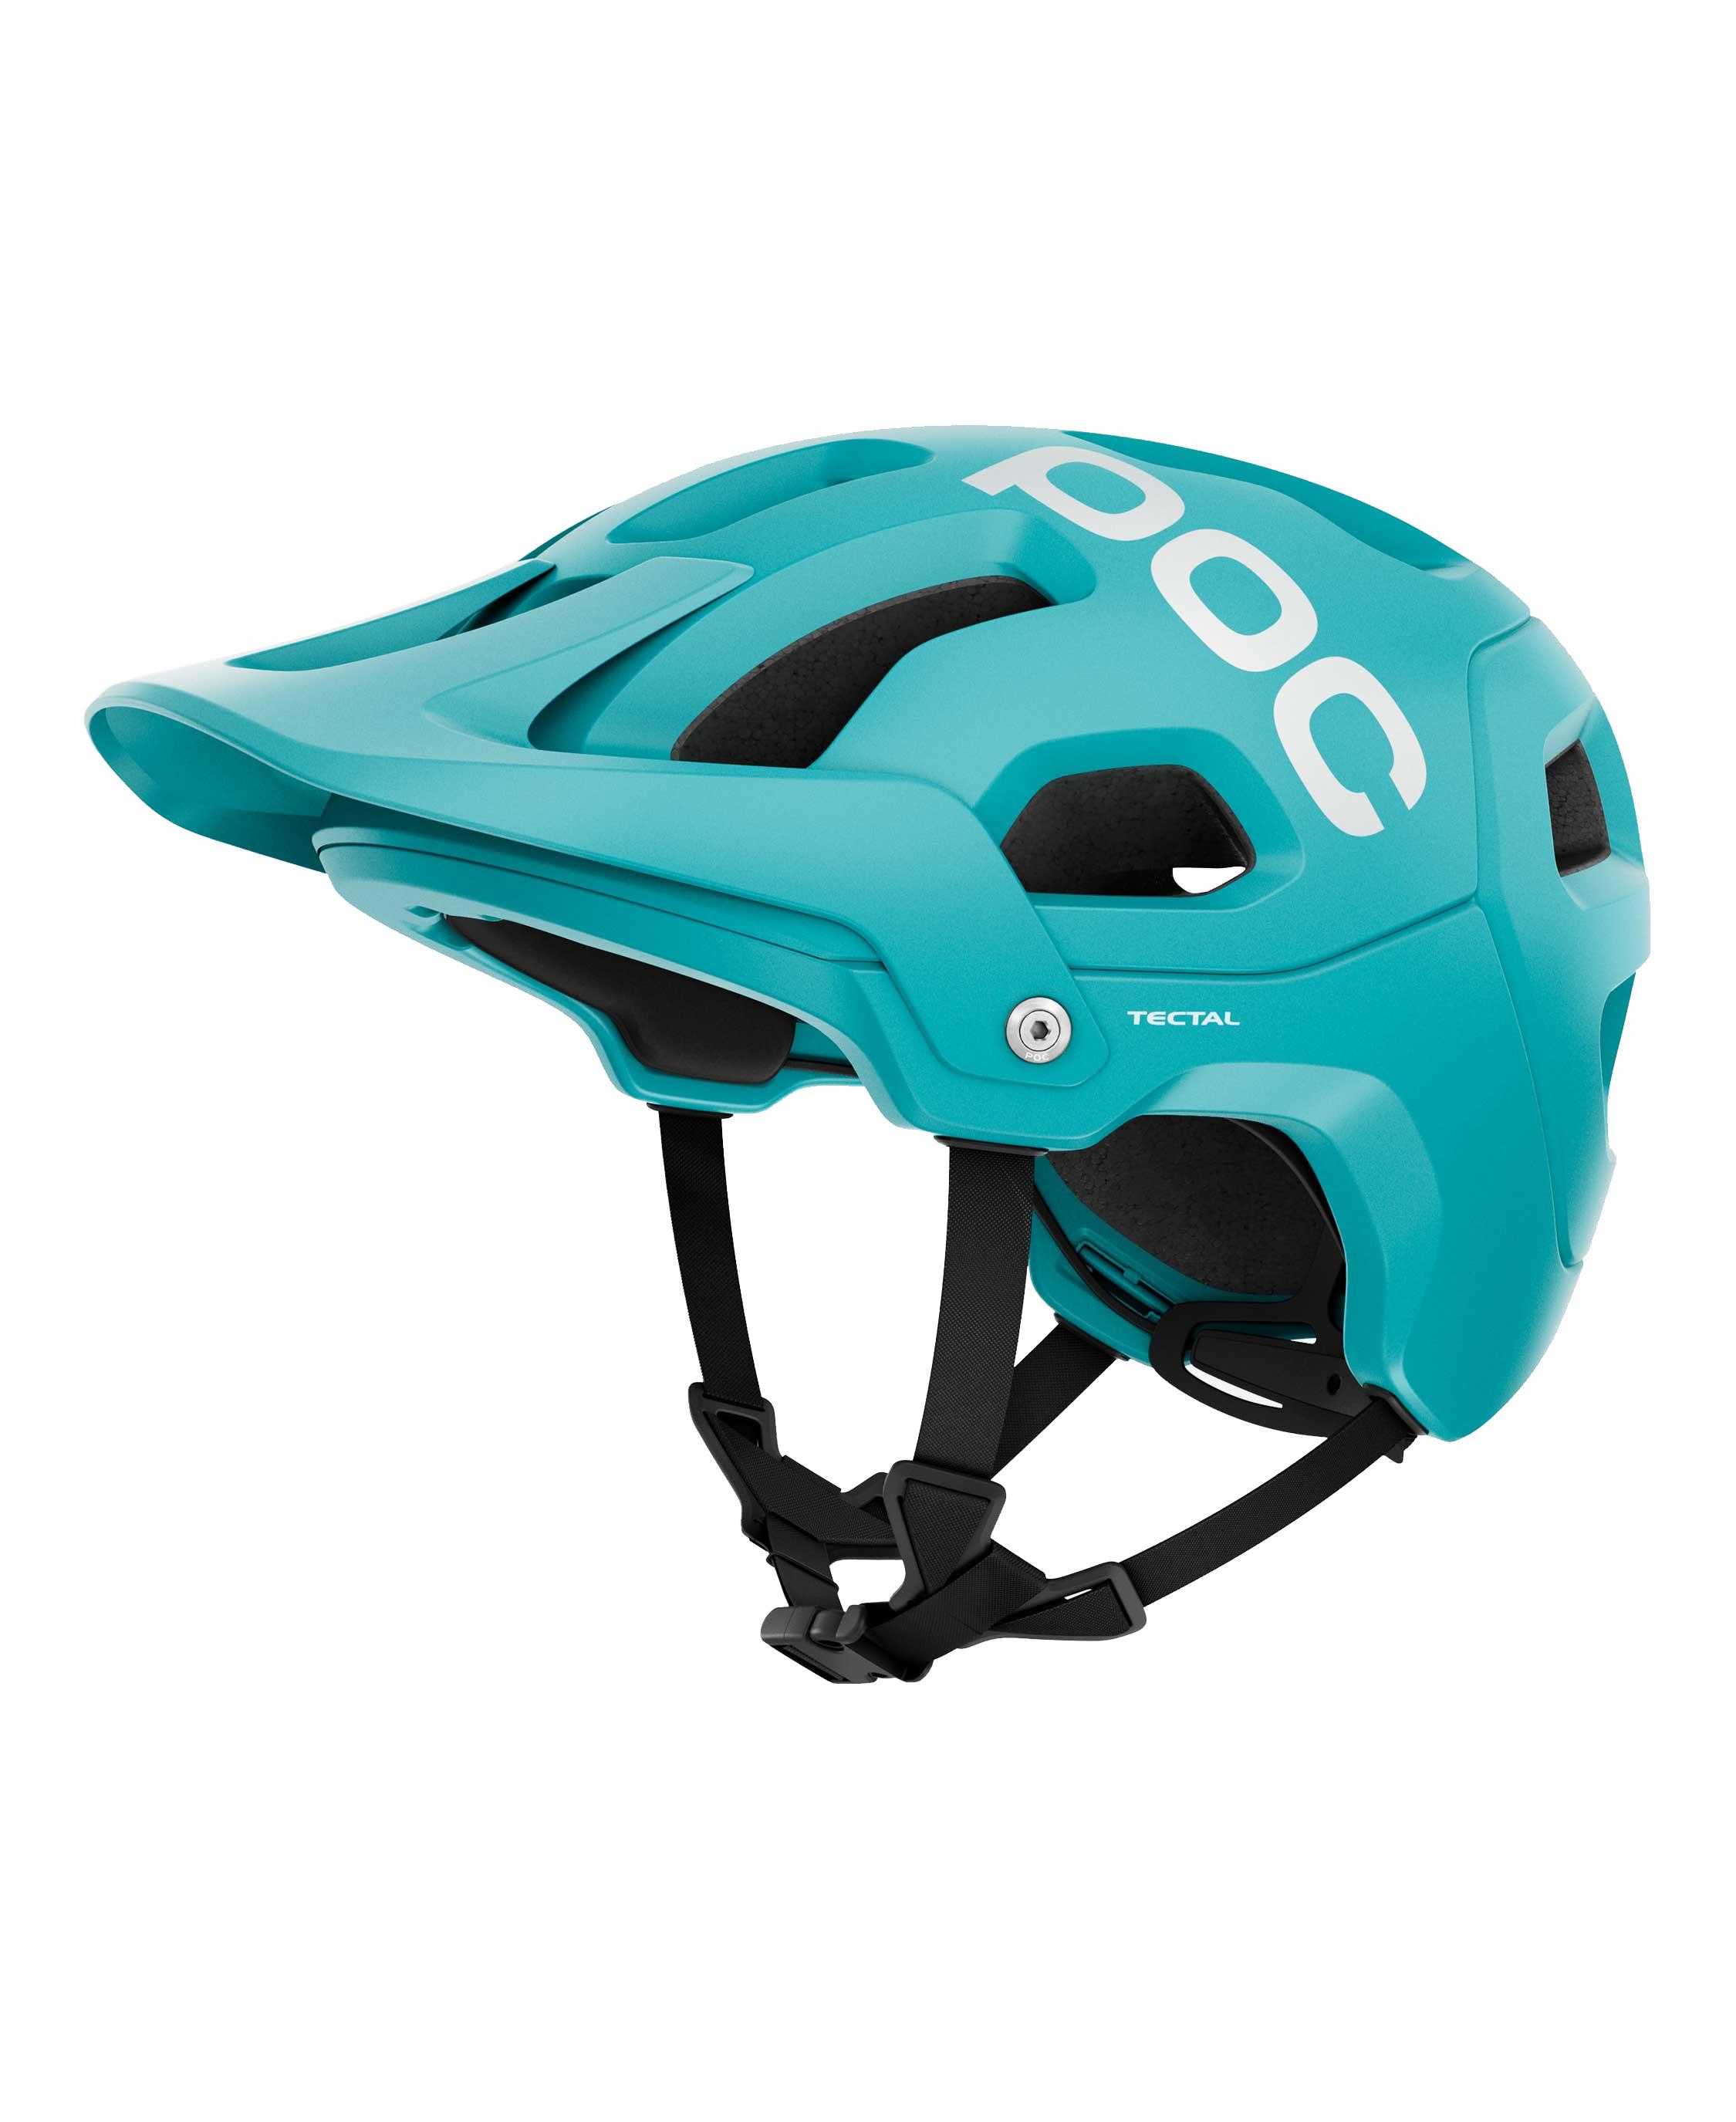 Poc | Tectal Helmet Men's | Size Extra Large/XX Large in Kalkopyrit Blue Matte